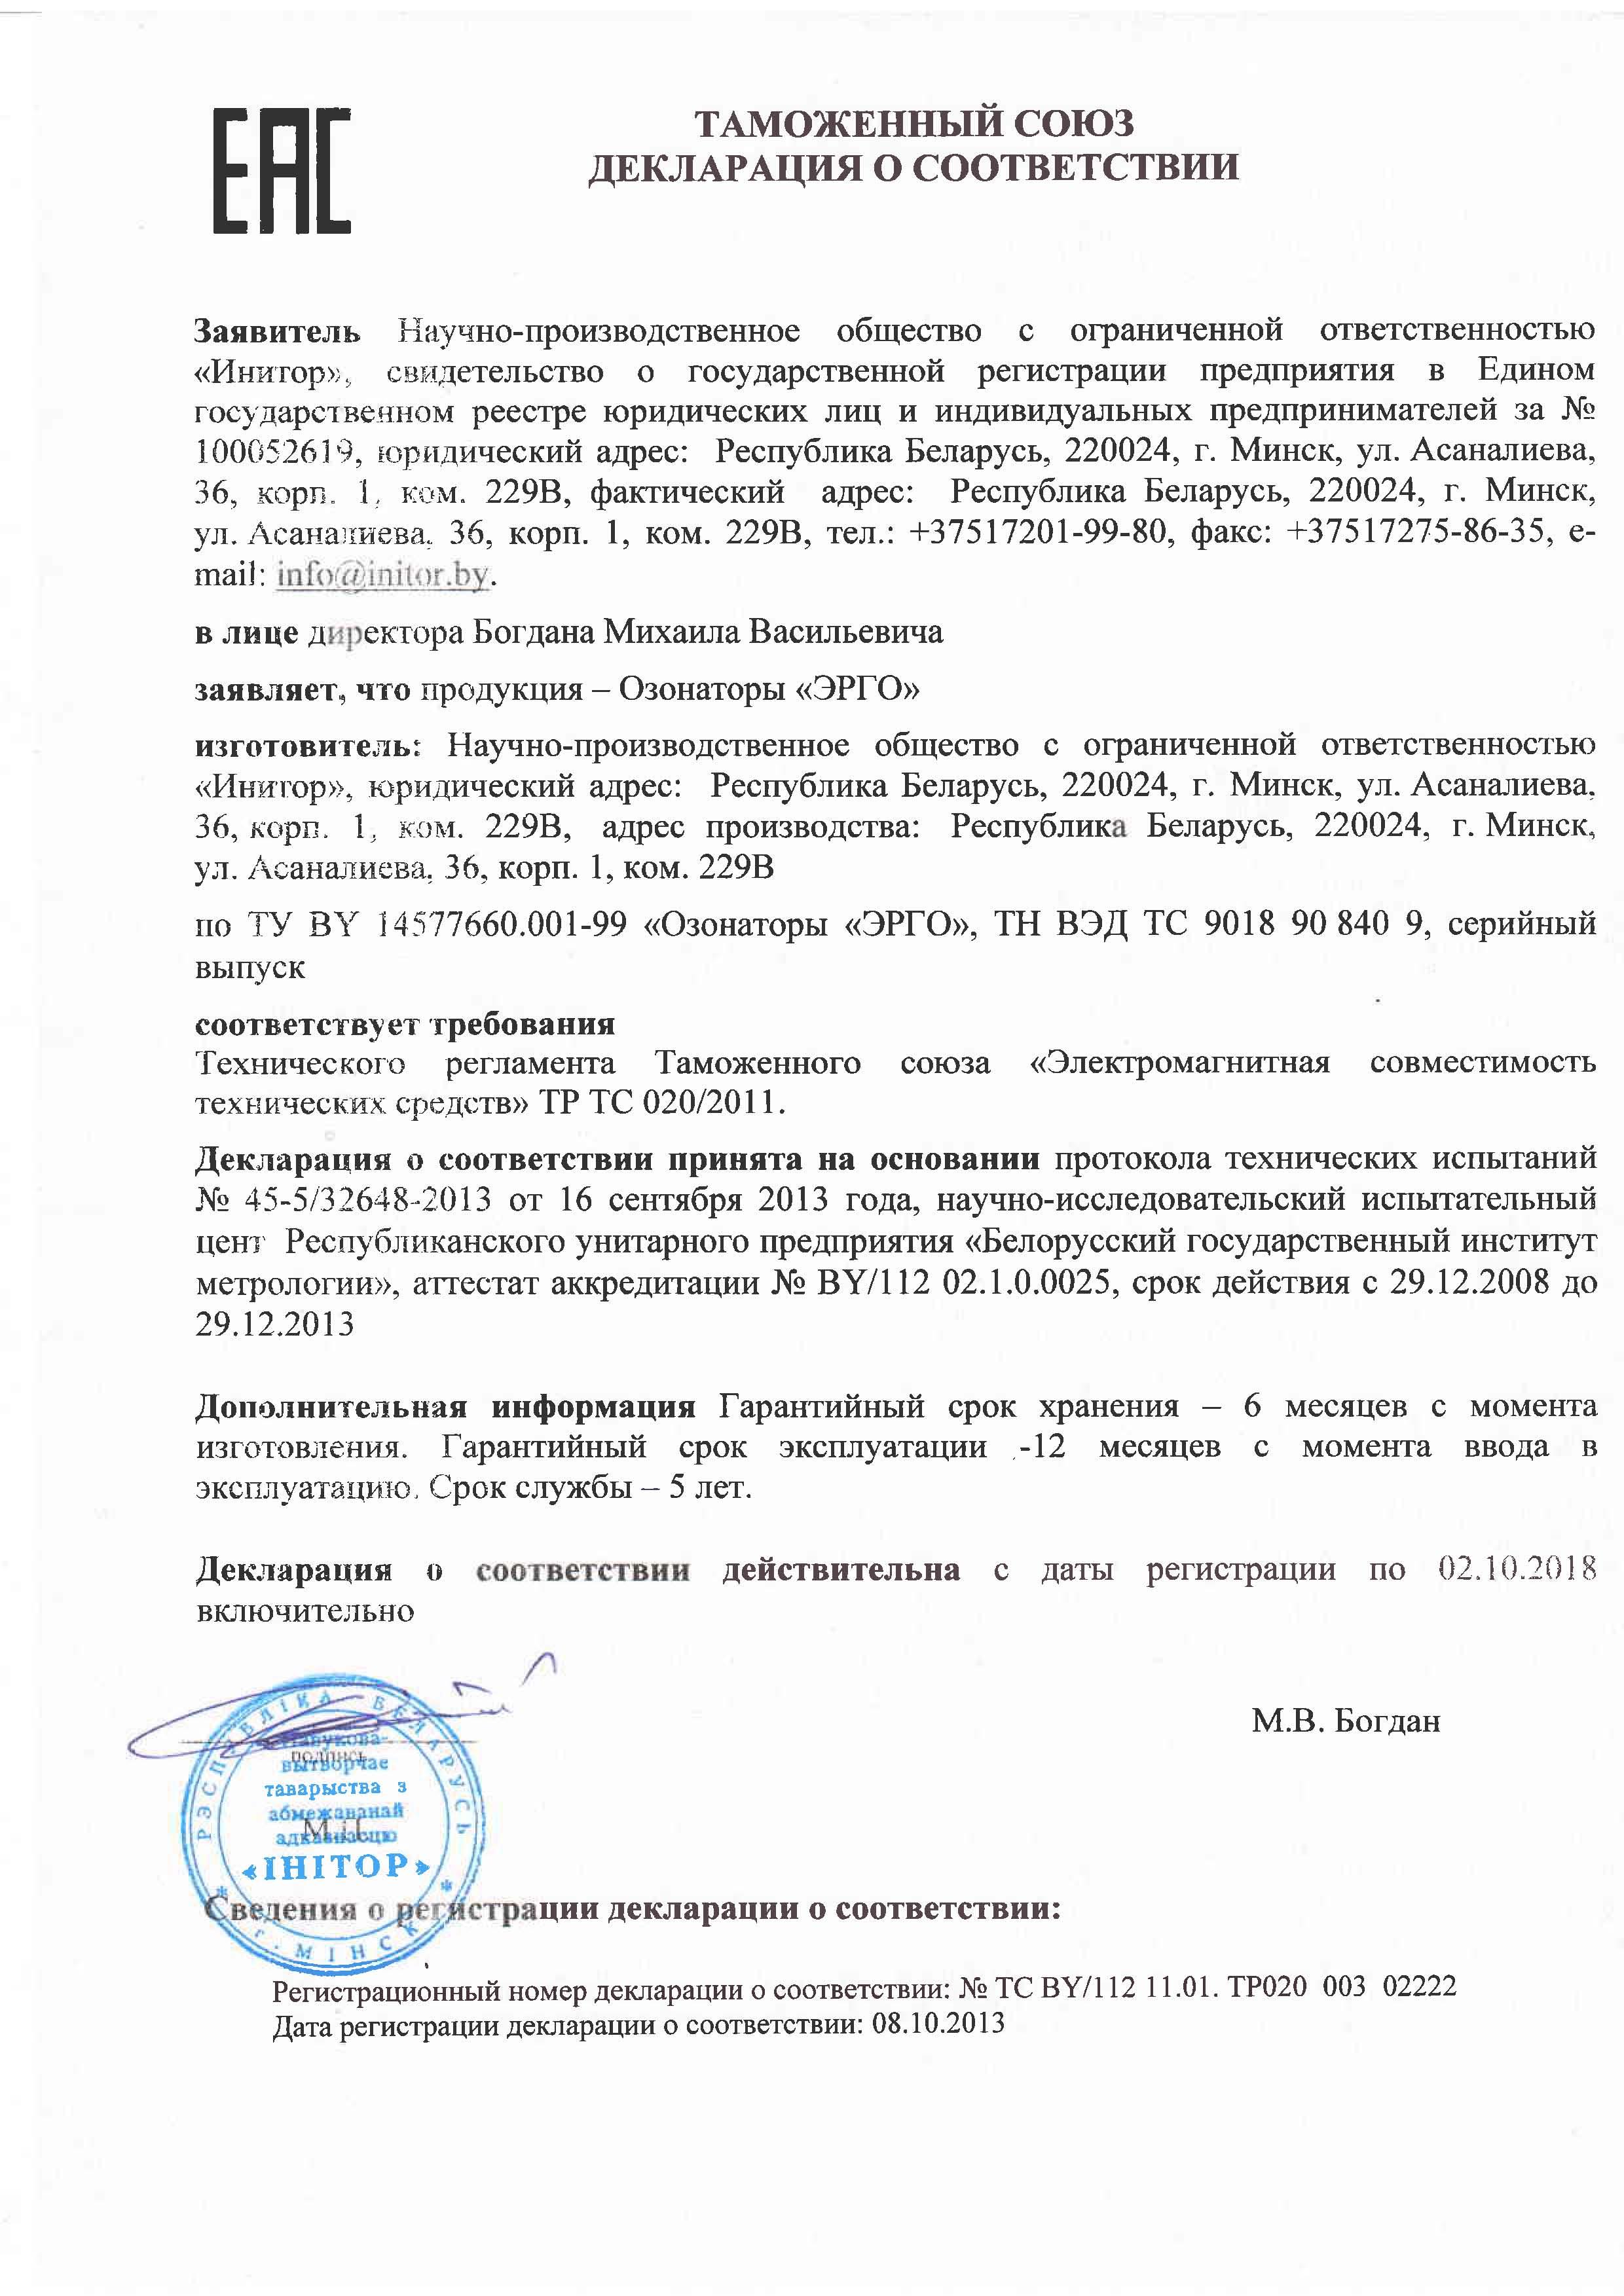 ЭРГО Деклар соотв ТС 2013_2018